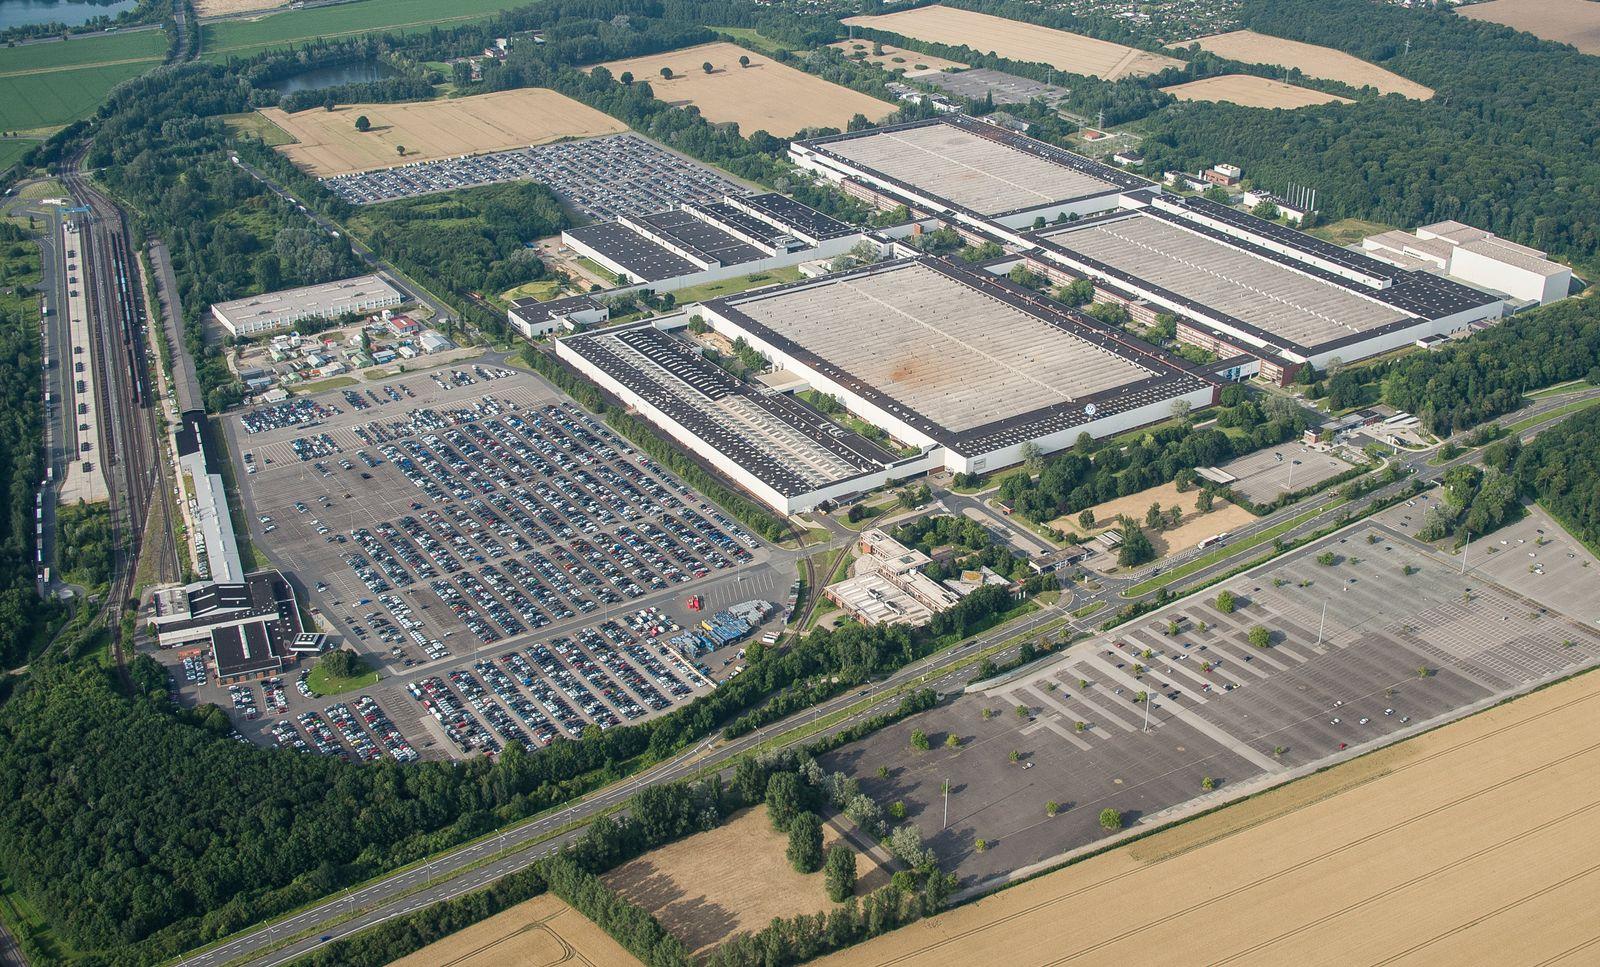 VW startet eigene Batteriezellfertigung